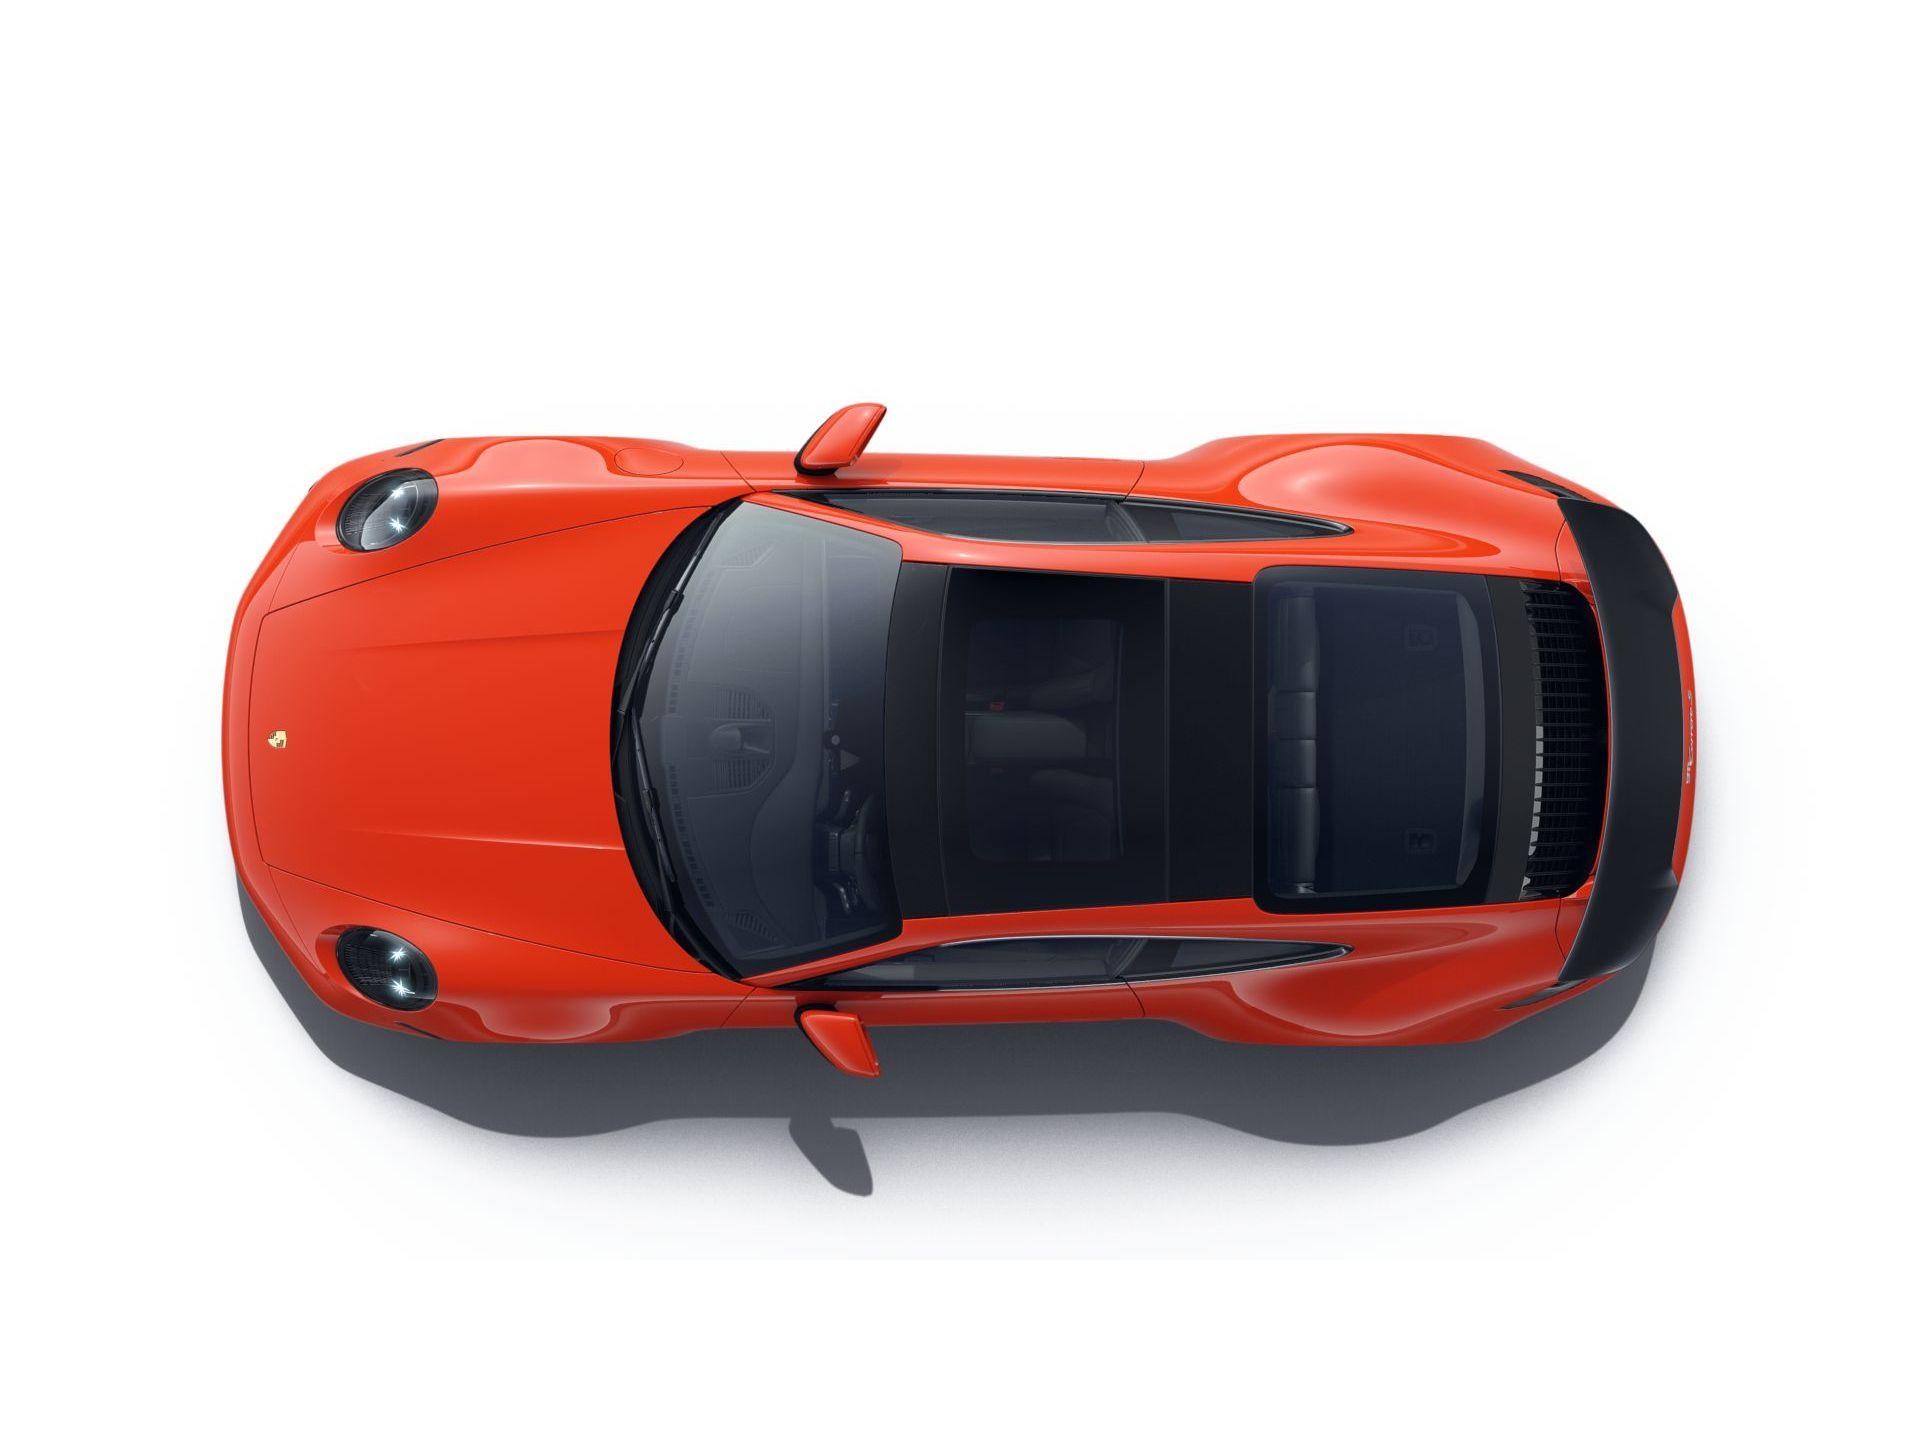 2022 Porsche 911 Carrera S – 4